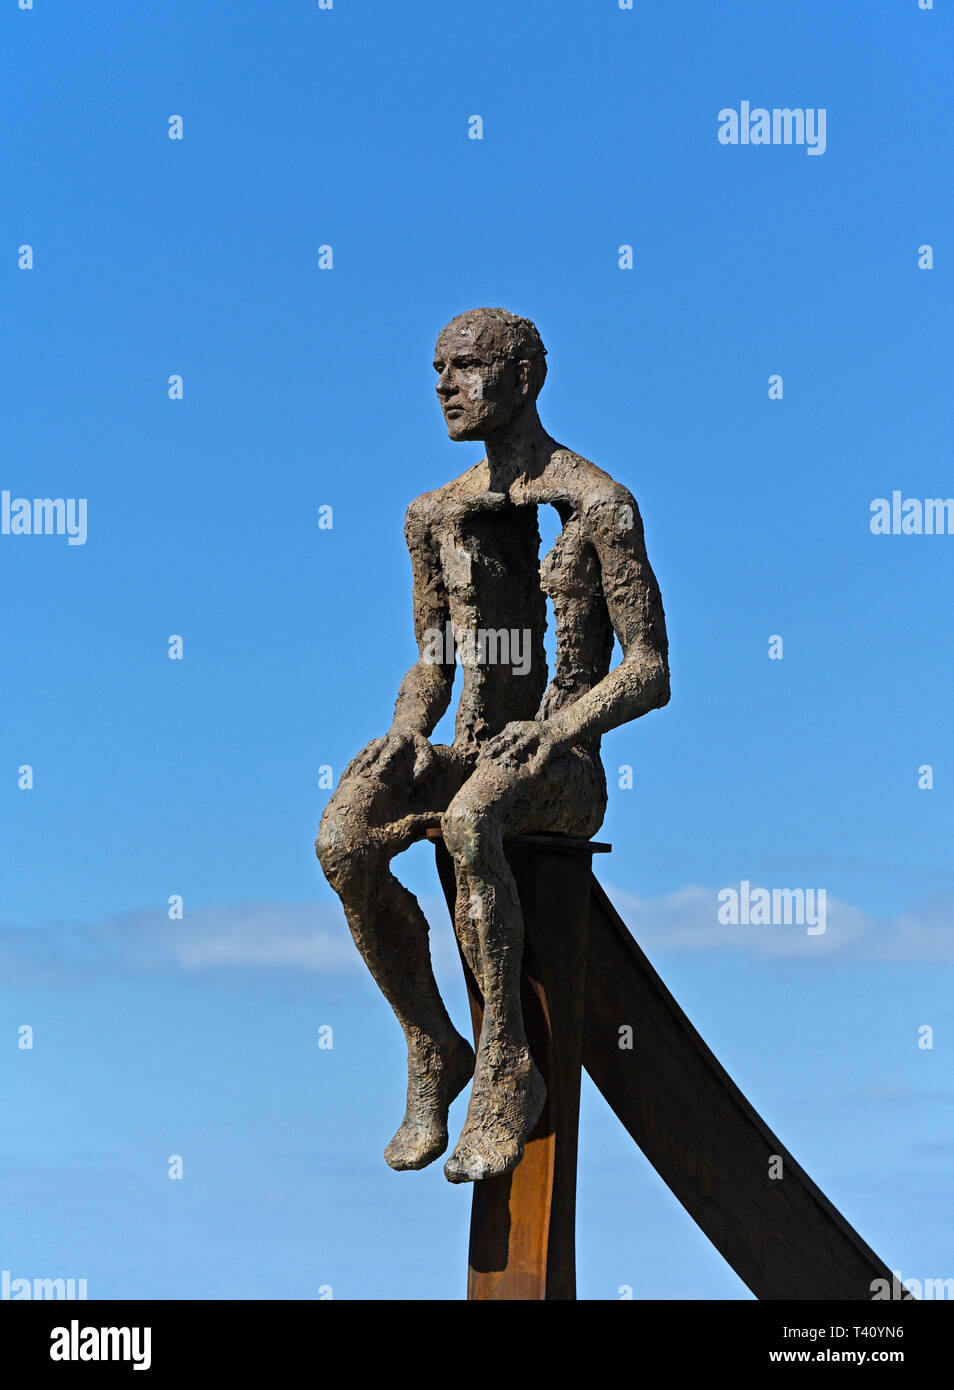 'Ship' (detail), metal sculpture by Anna Gillespie, 2019. Half Moon Bay, Heysham, Lancashire, England, United Kingdom, Europe. - Stock Image